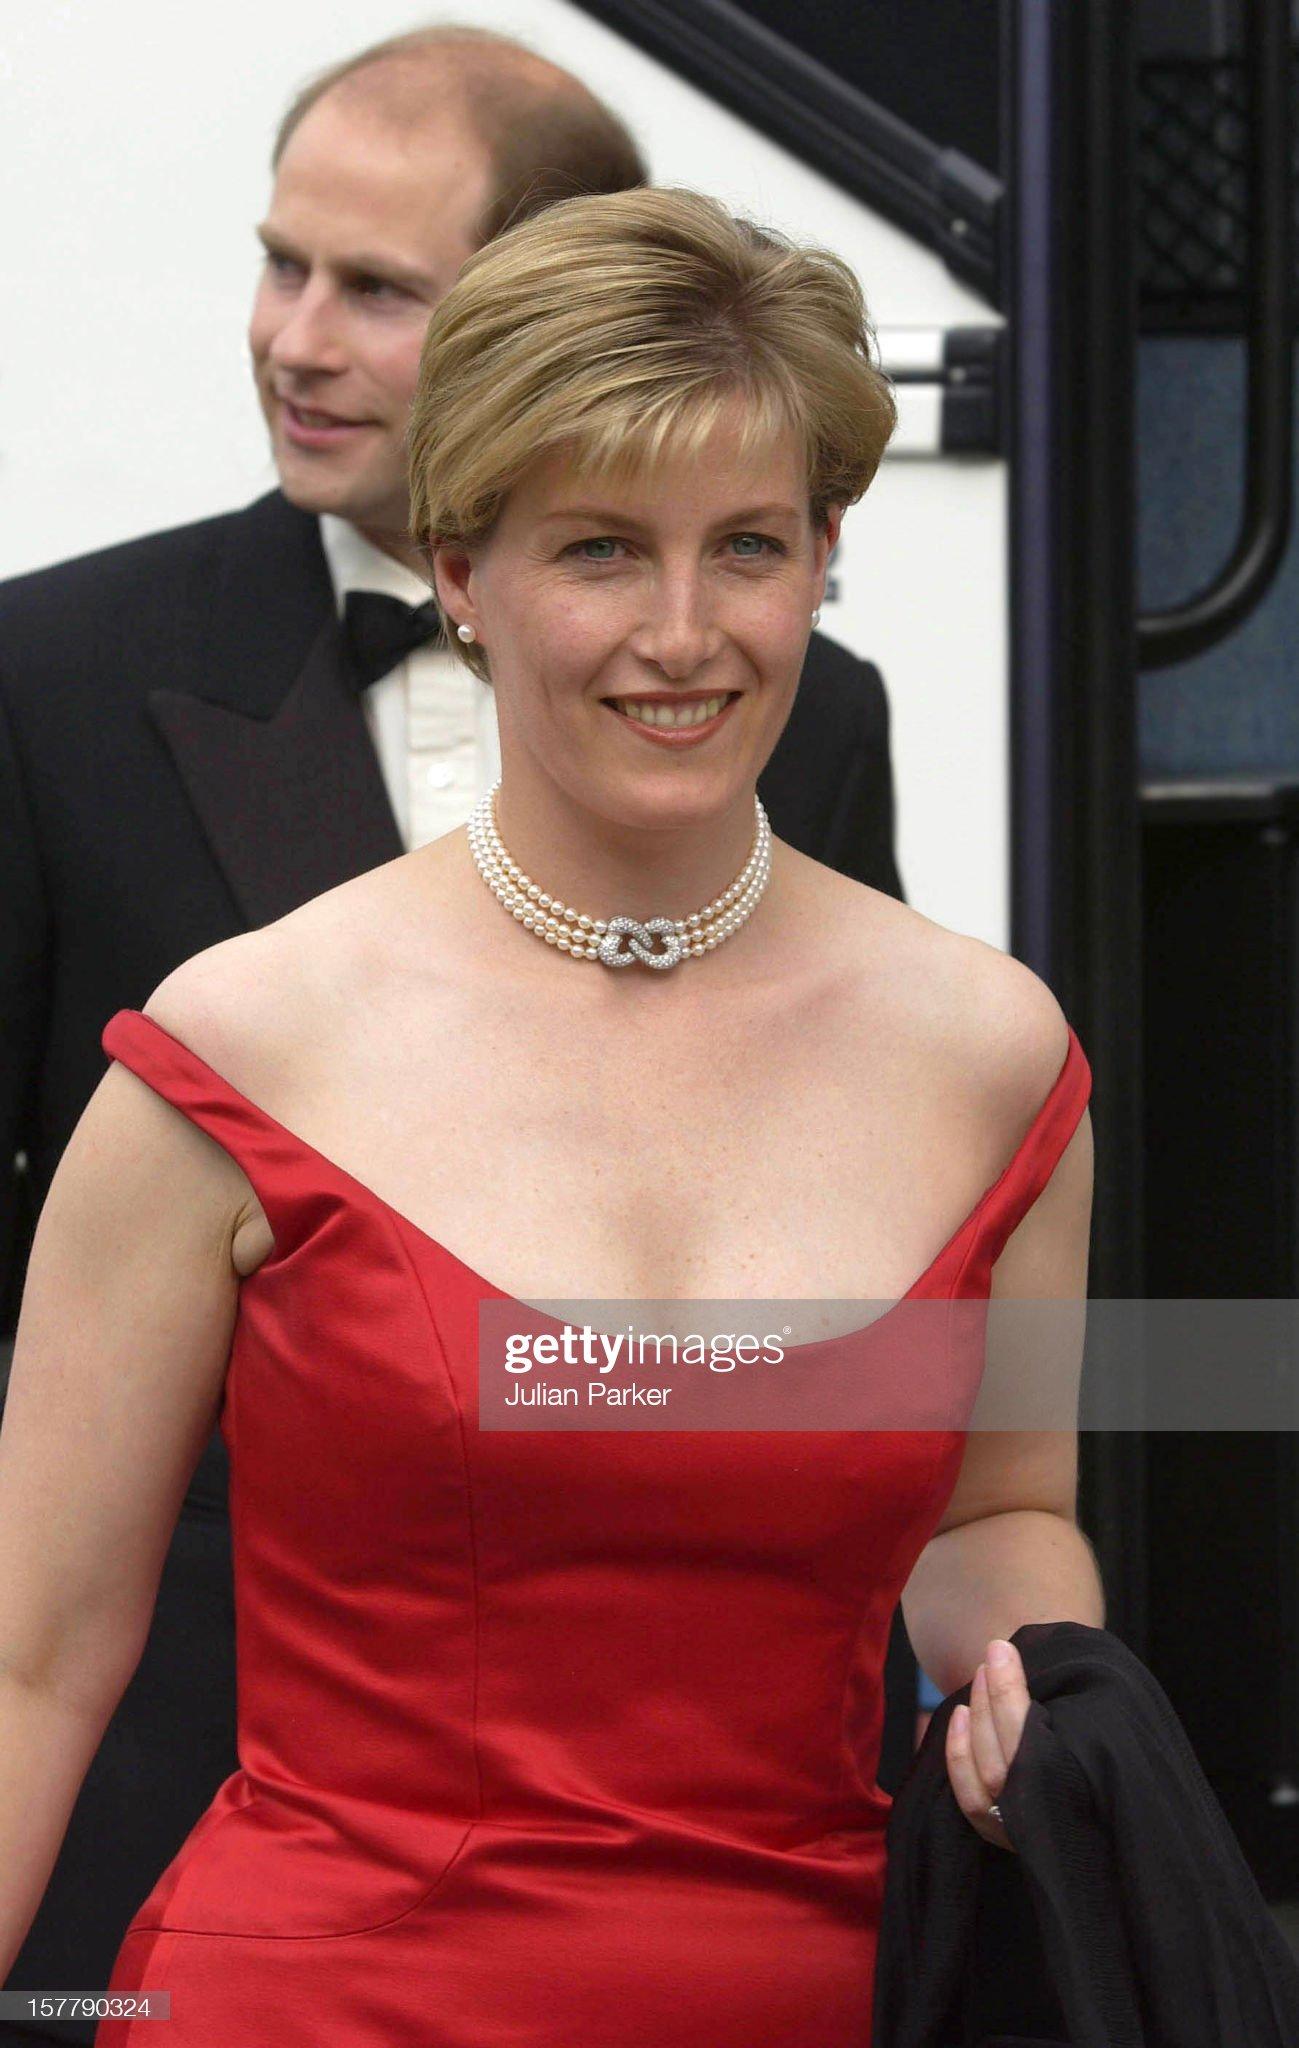 The Wedding Of Princess Martha Louise Of Norway And Ari Behn. : News Photo